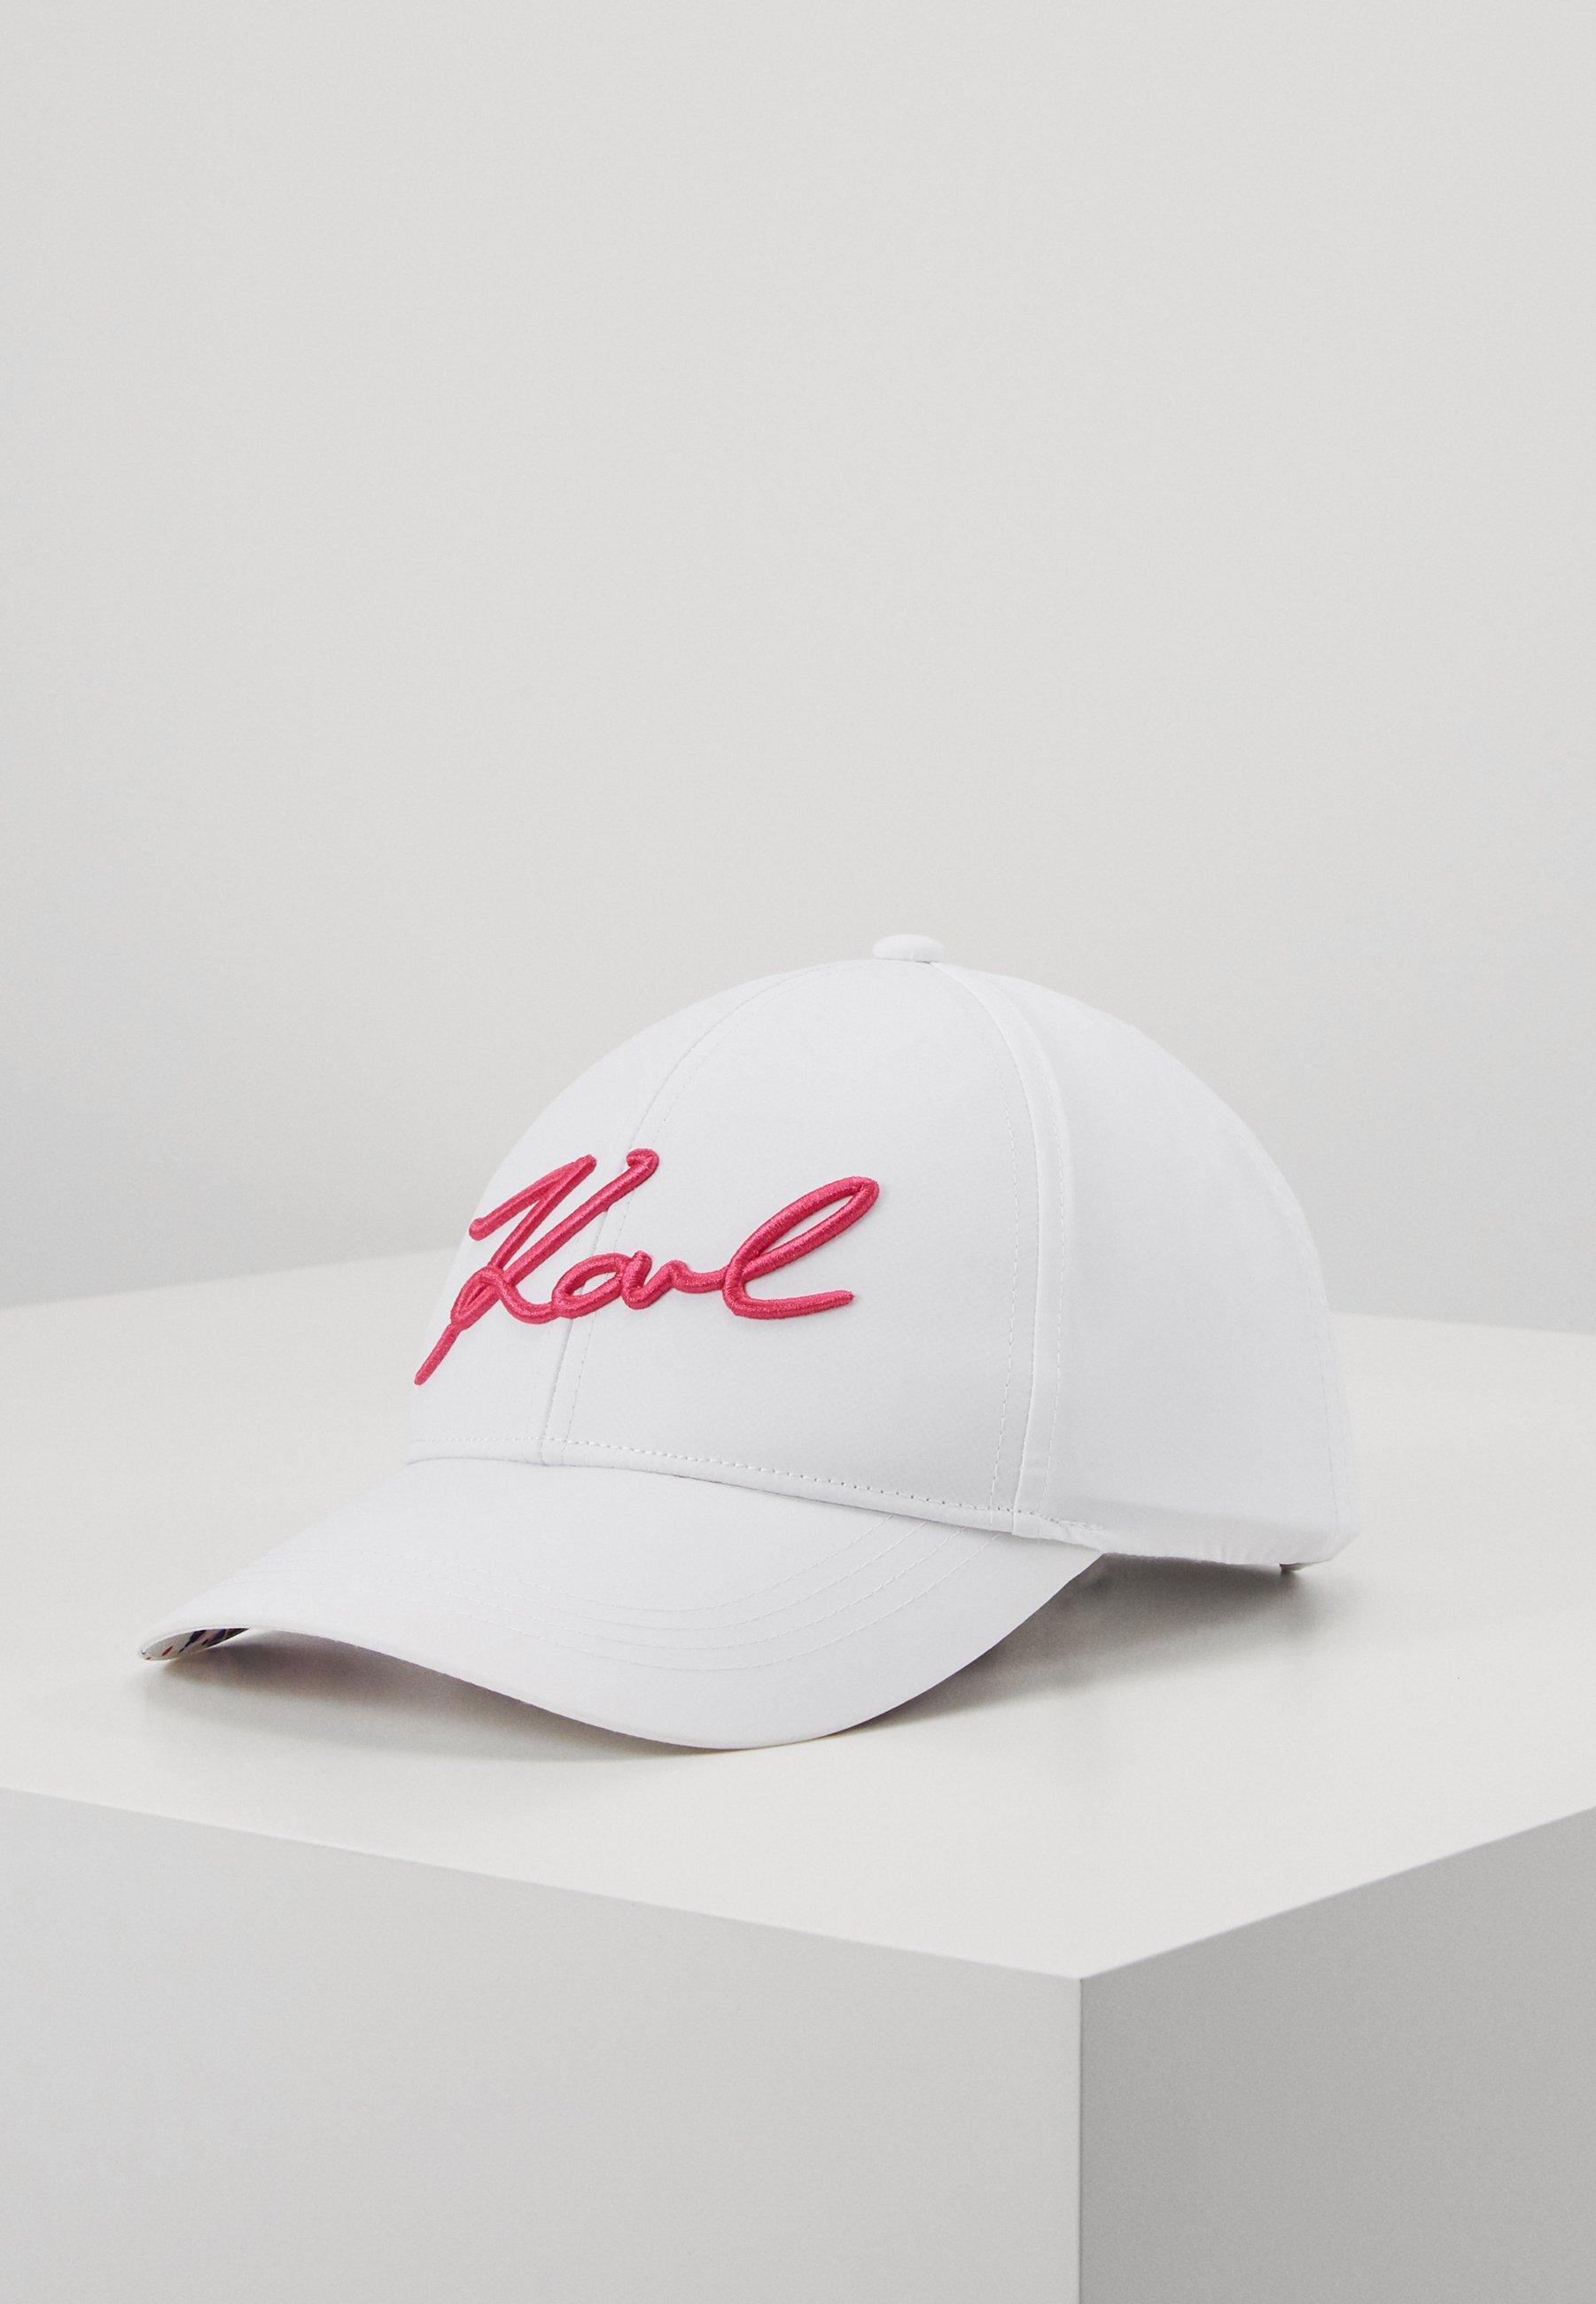 KARL LAGERFELD SIGNATURE CAP VISOR PRINT - Cap - white/multi/hvit OT71o3NvE2KOKKP